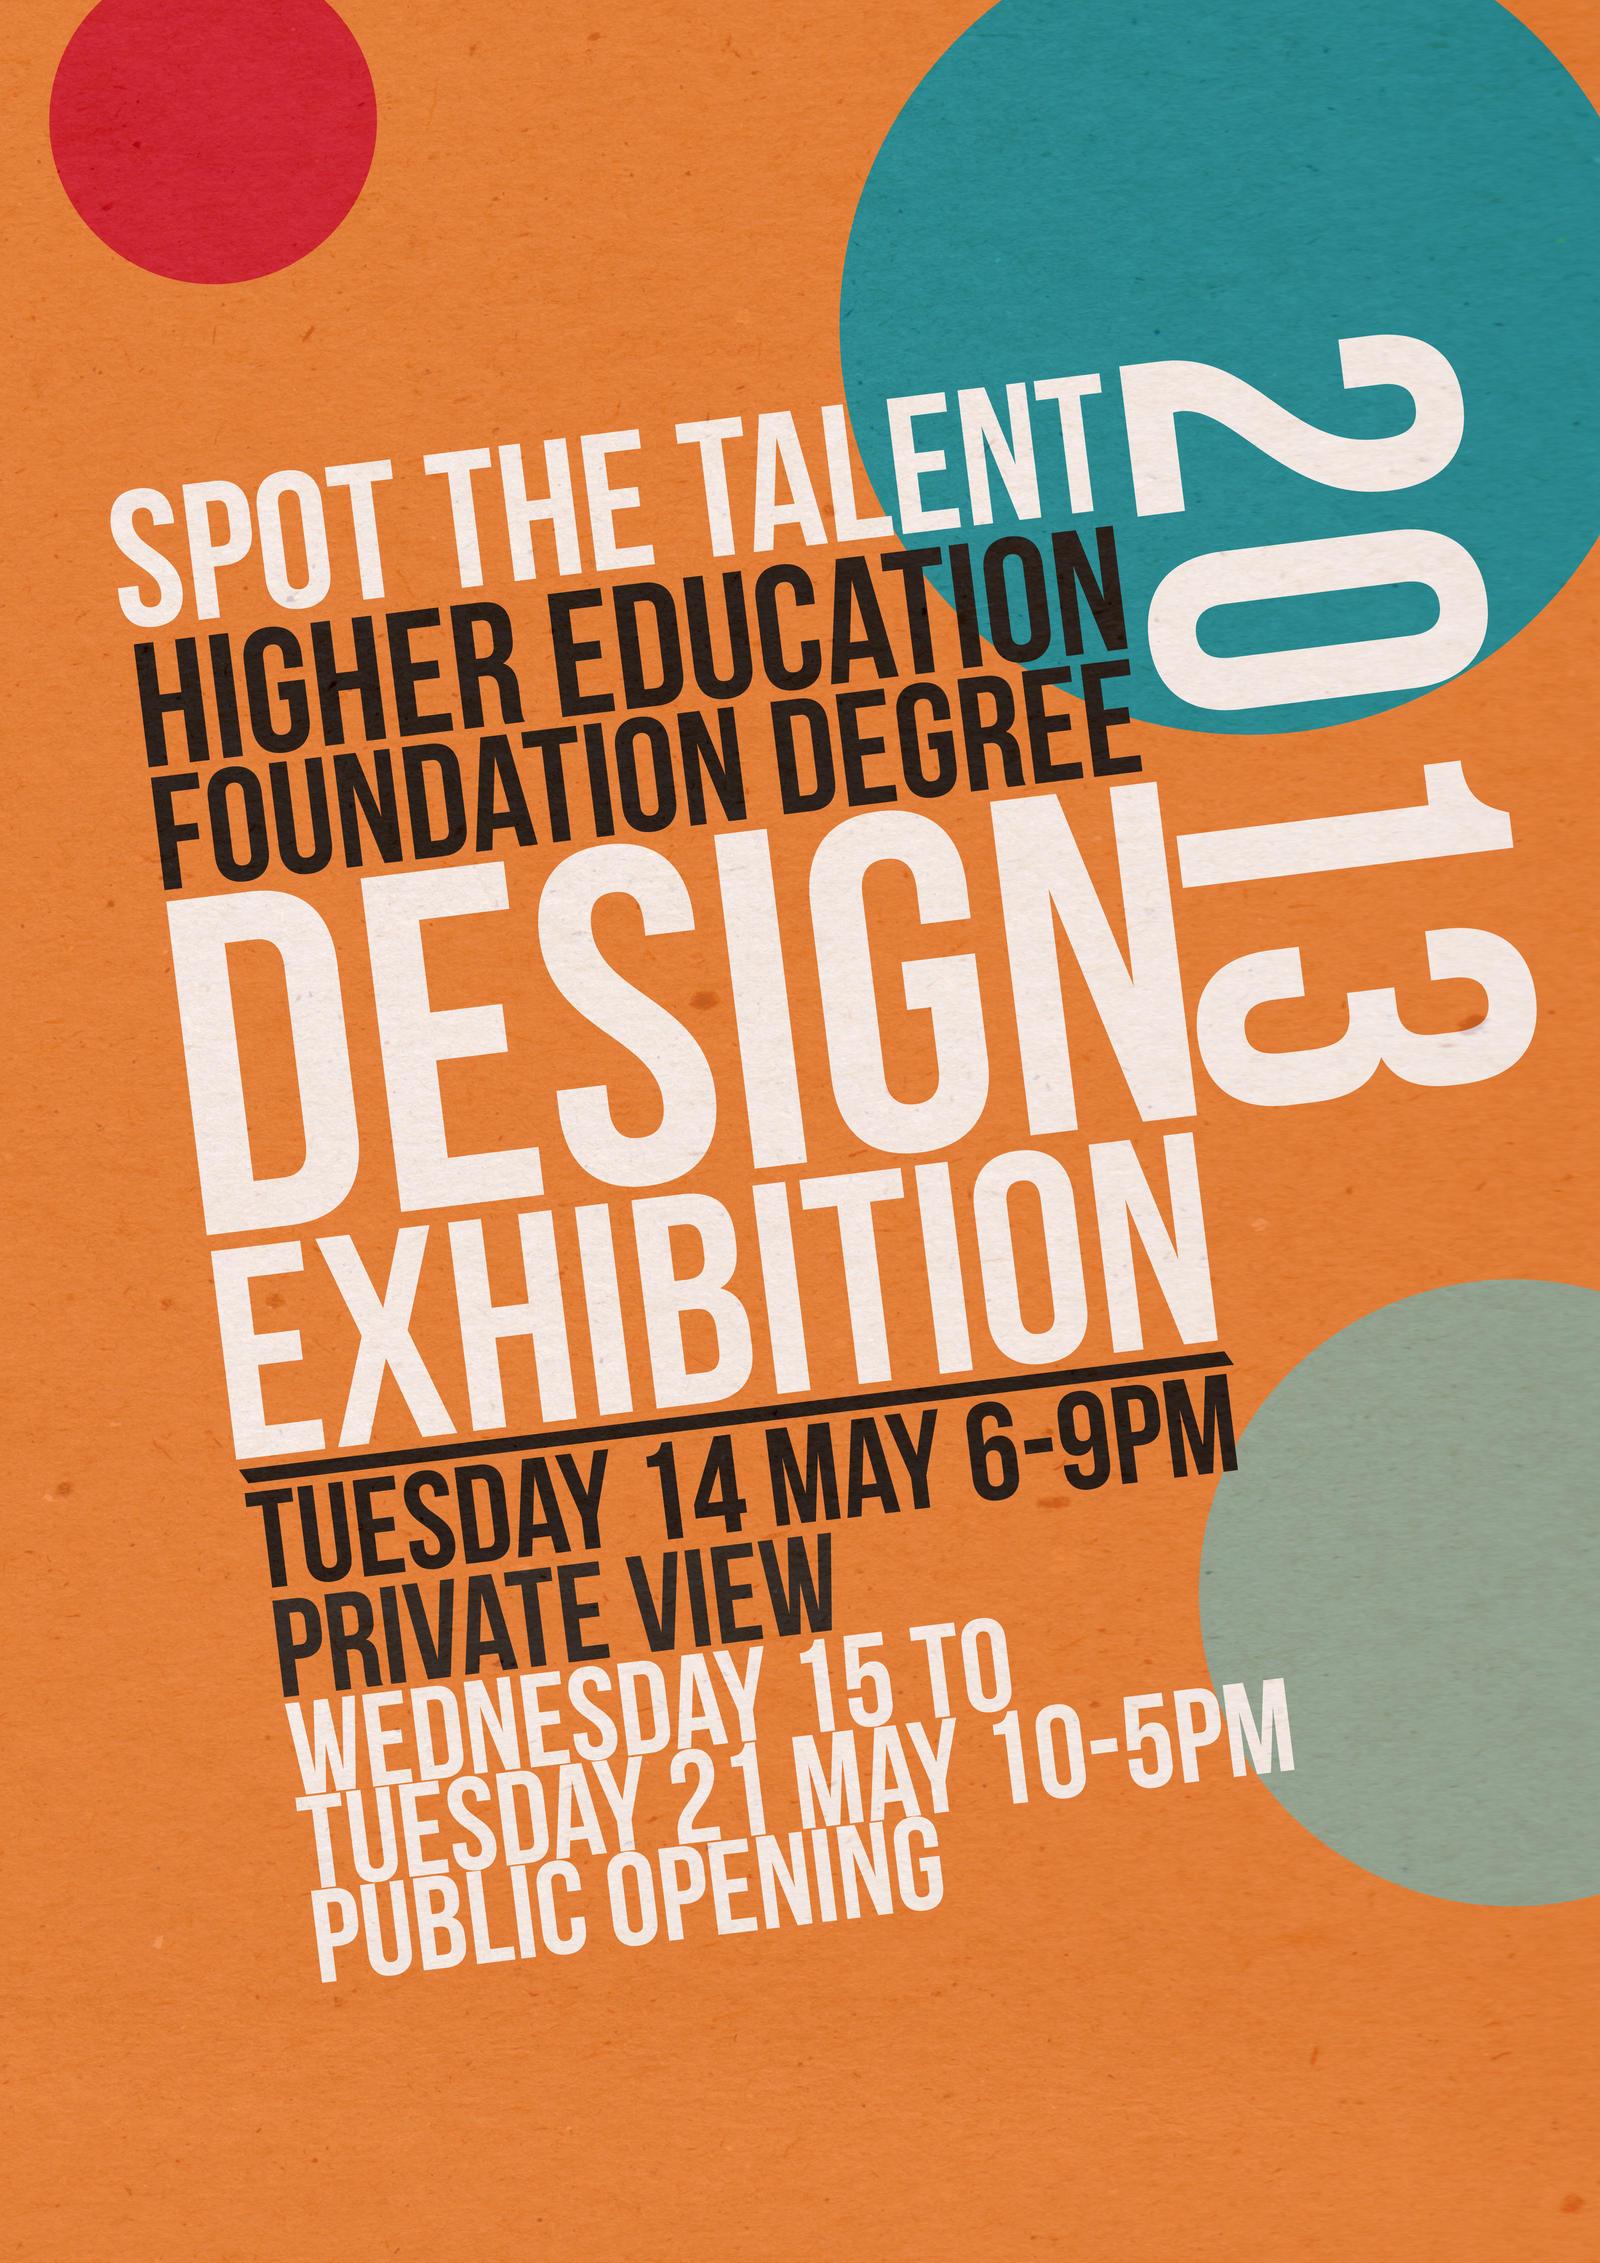 Poster design typography - Design Exhibition Typography Poster By Animusmedia Design Exhibition Typography Poster By Animusmedia